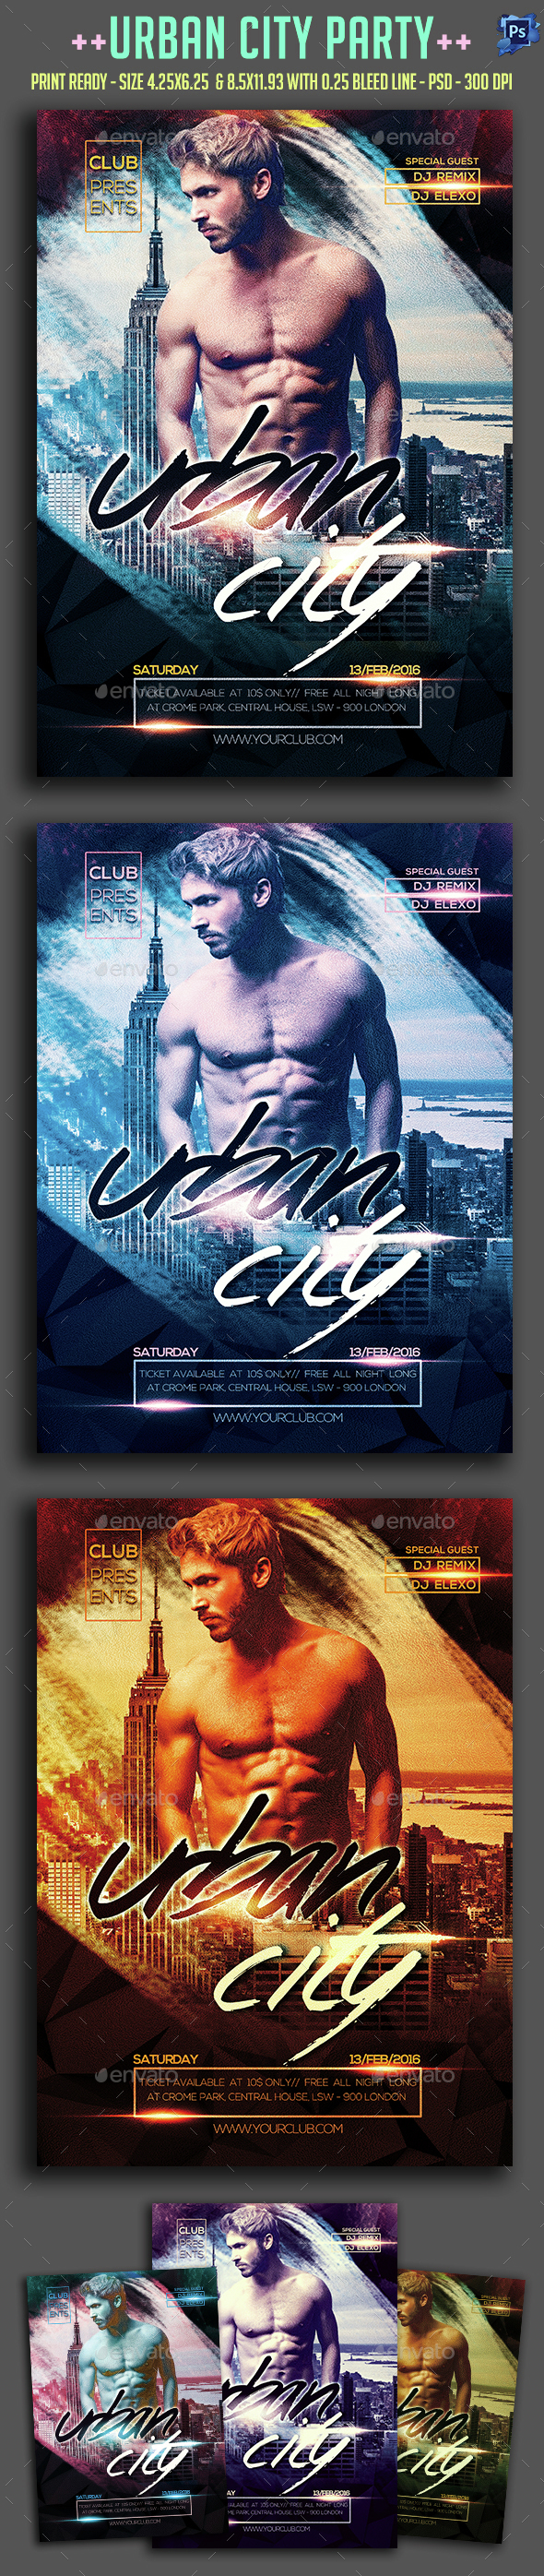 Urban City Party Flyer